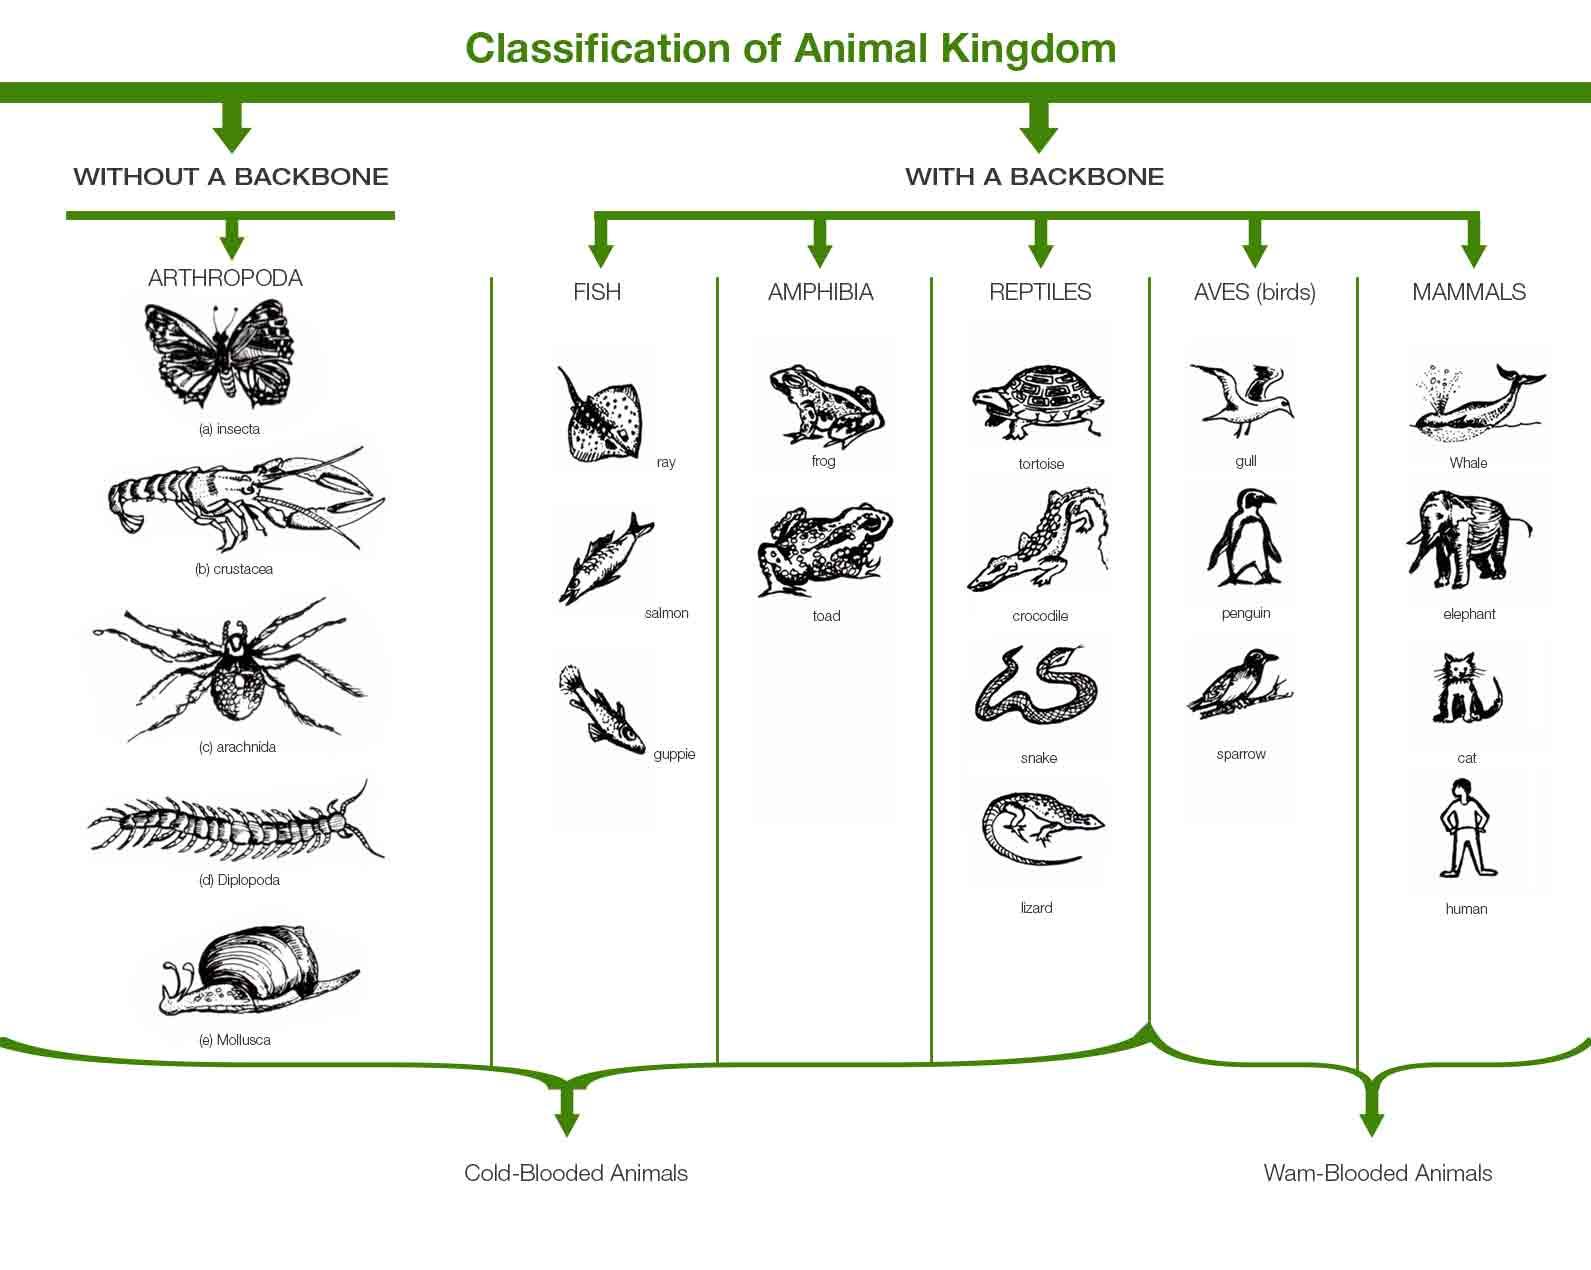 https://byjus.com/biology/classification-of-animal-kingdom/amp/